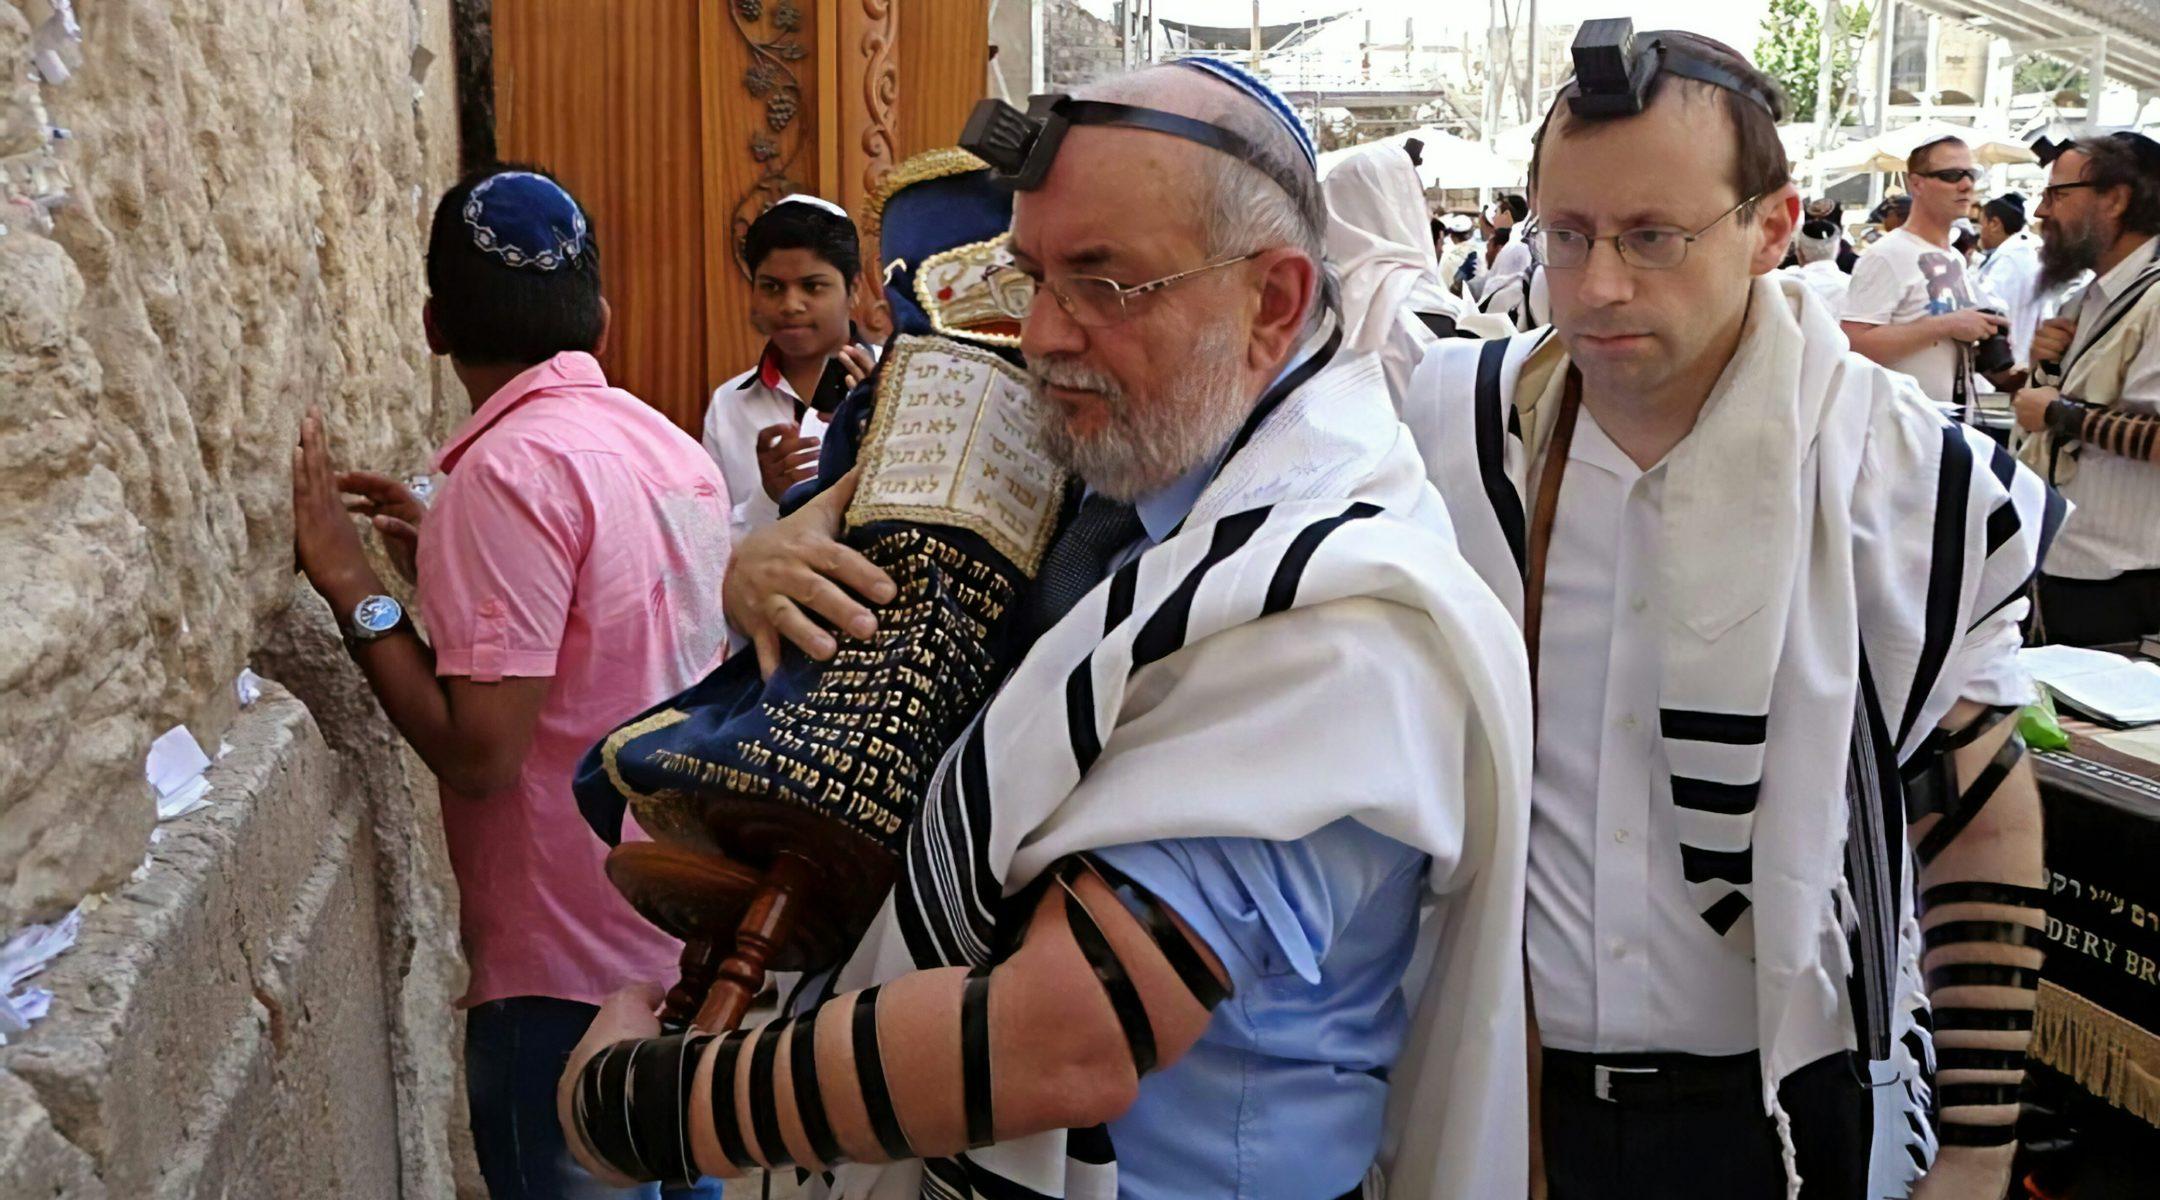 Mariusz Robert Opałko, holding a Torah scroll, and Michael Freund at the Western Wall in Jerusalem, Israel on June 9, 2013. (Courtesy of Shavei Israel)